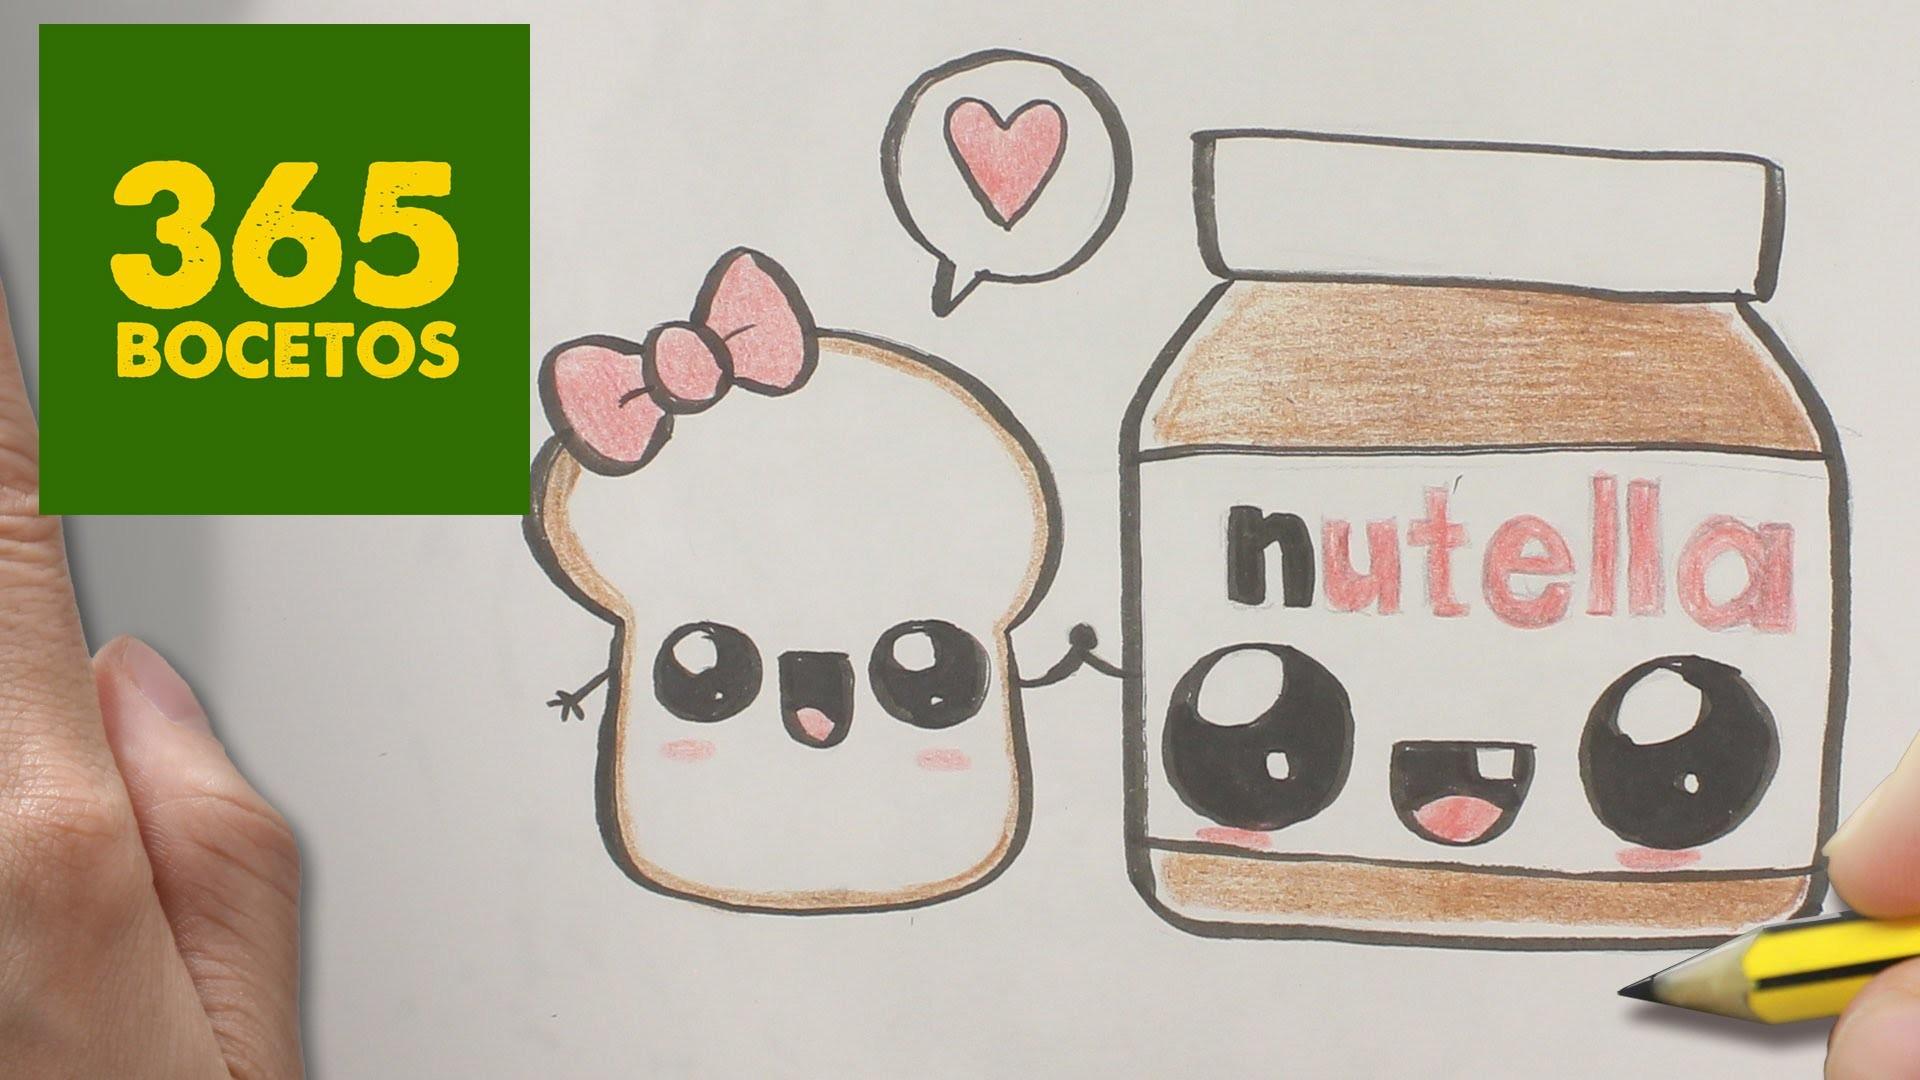 COMO DIBUJAR NUTELLA Y PAN KAWAII PASO A PASO - Dibujos kawaii faciles - How to draw a Nutella